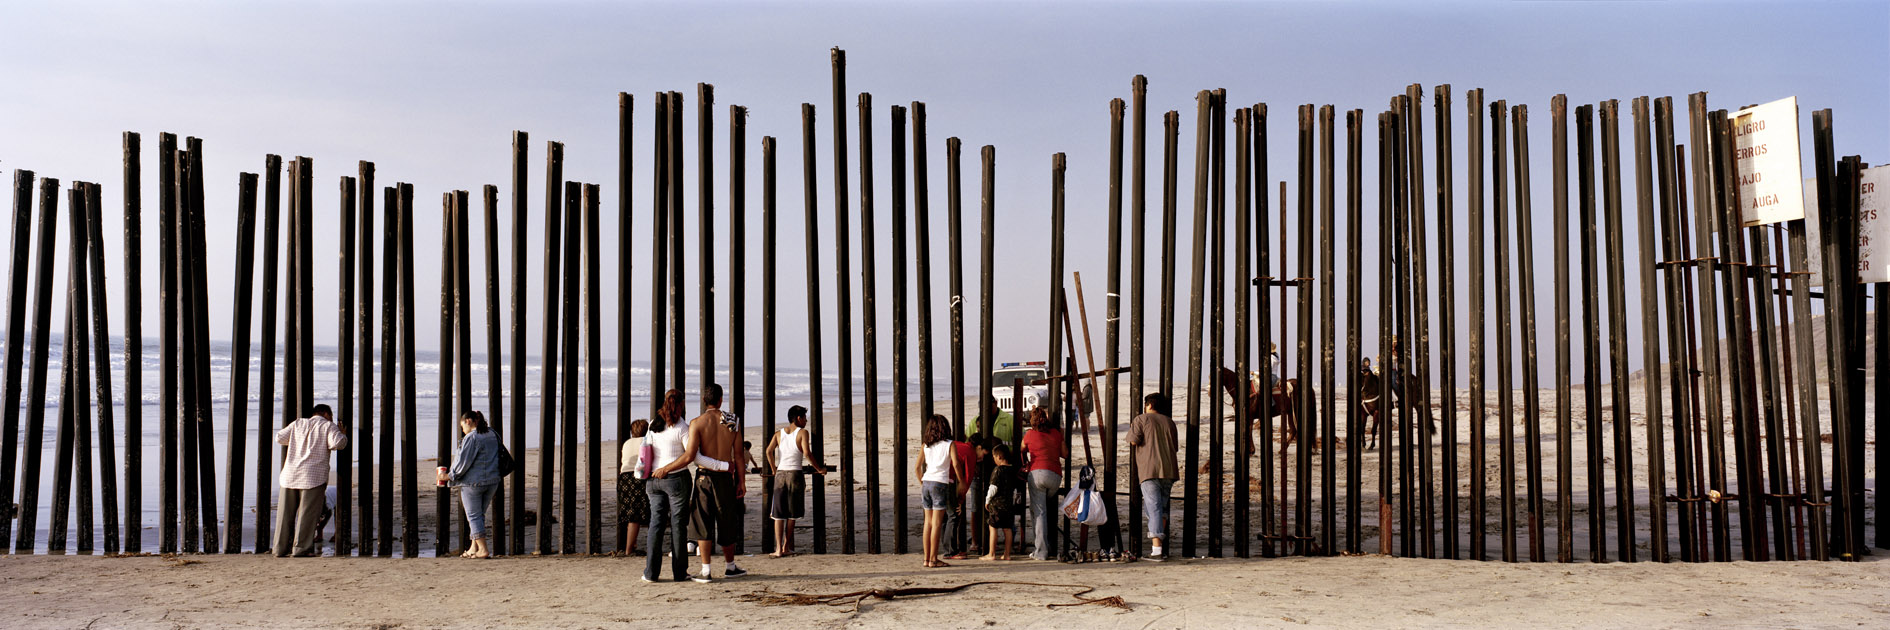 Kai Wiedenhöfer, limite final da fronteira México-Estados Unidos se estendendo para o Oceano Pacífico, Tijuana, México, 2008.